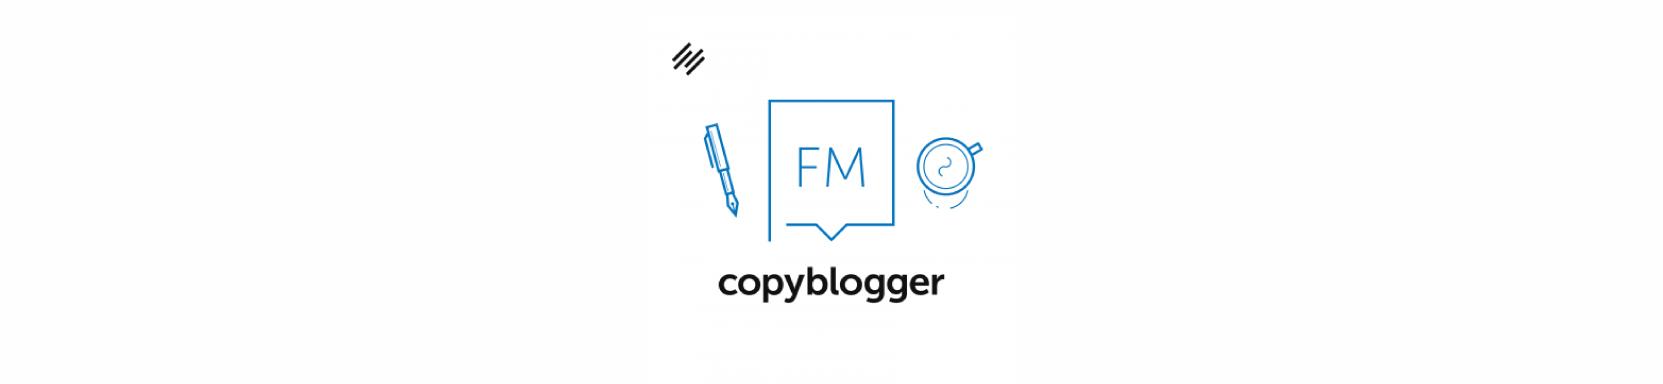 Copyblogger marketing podcast